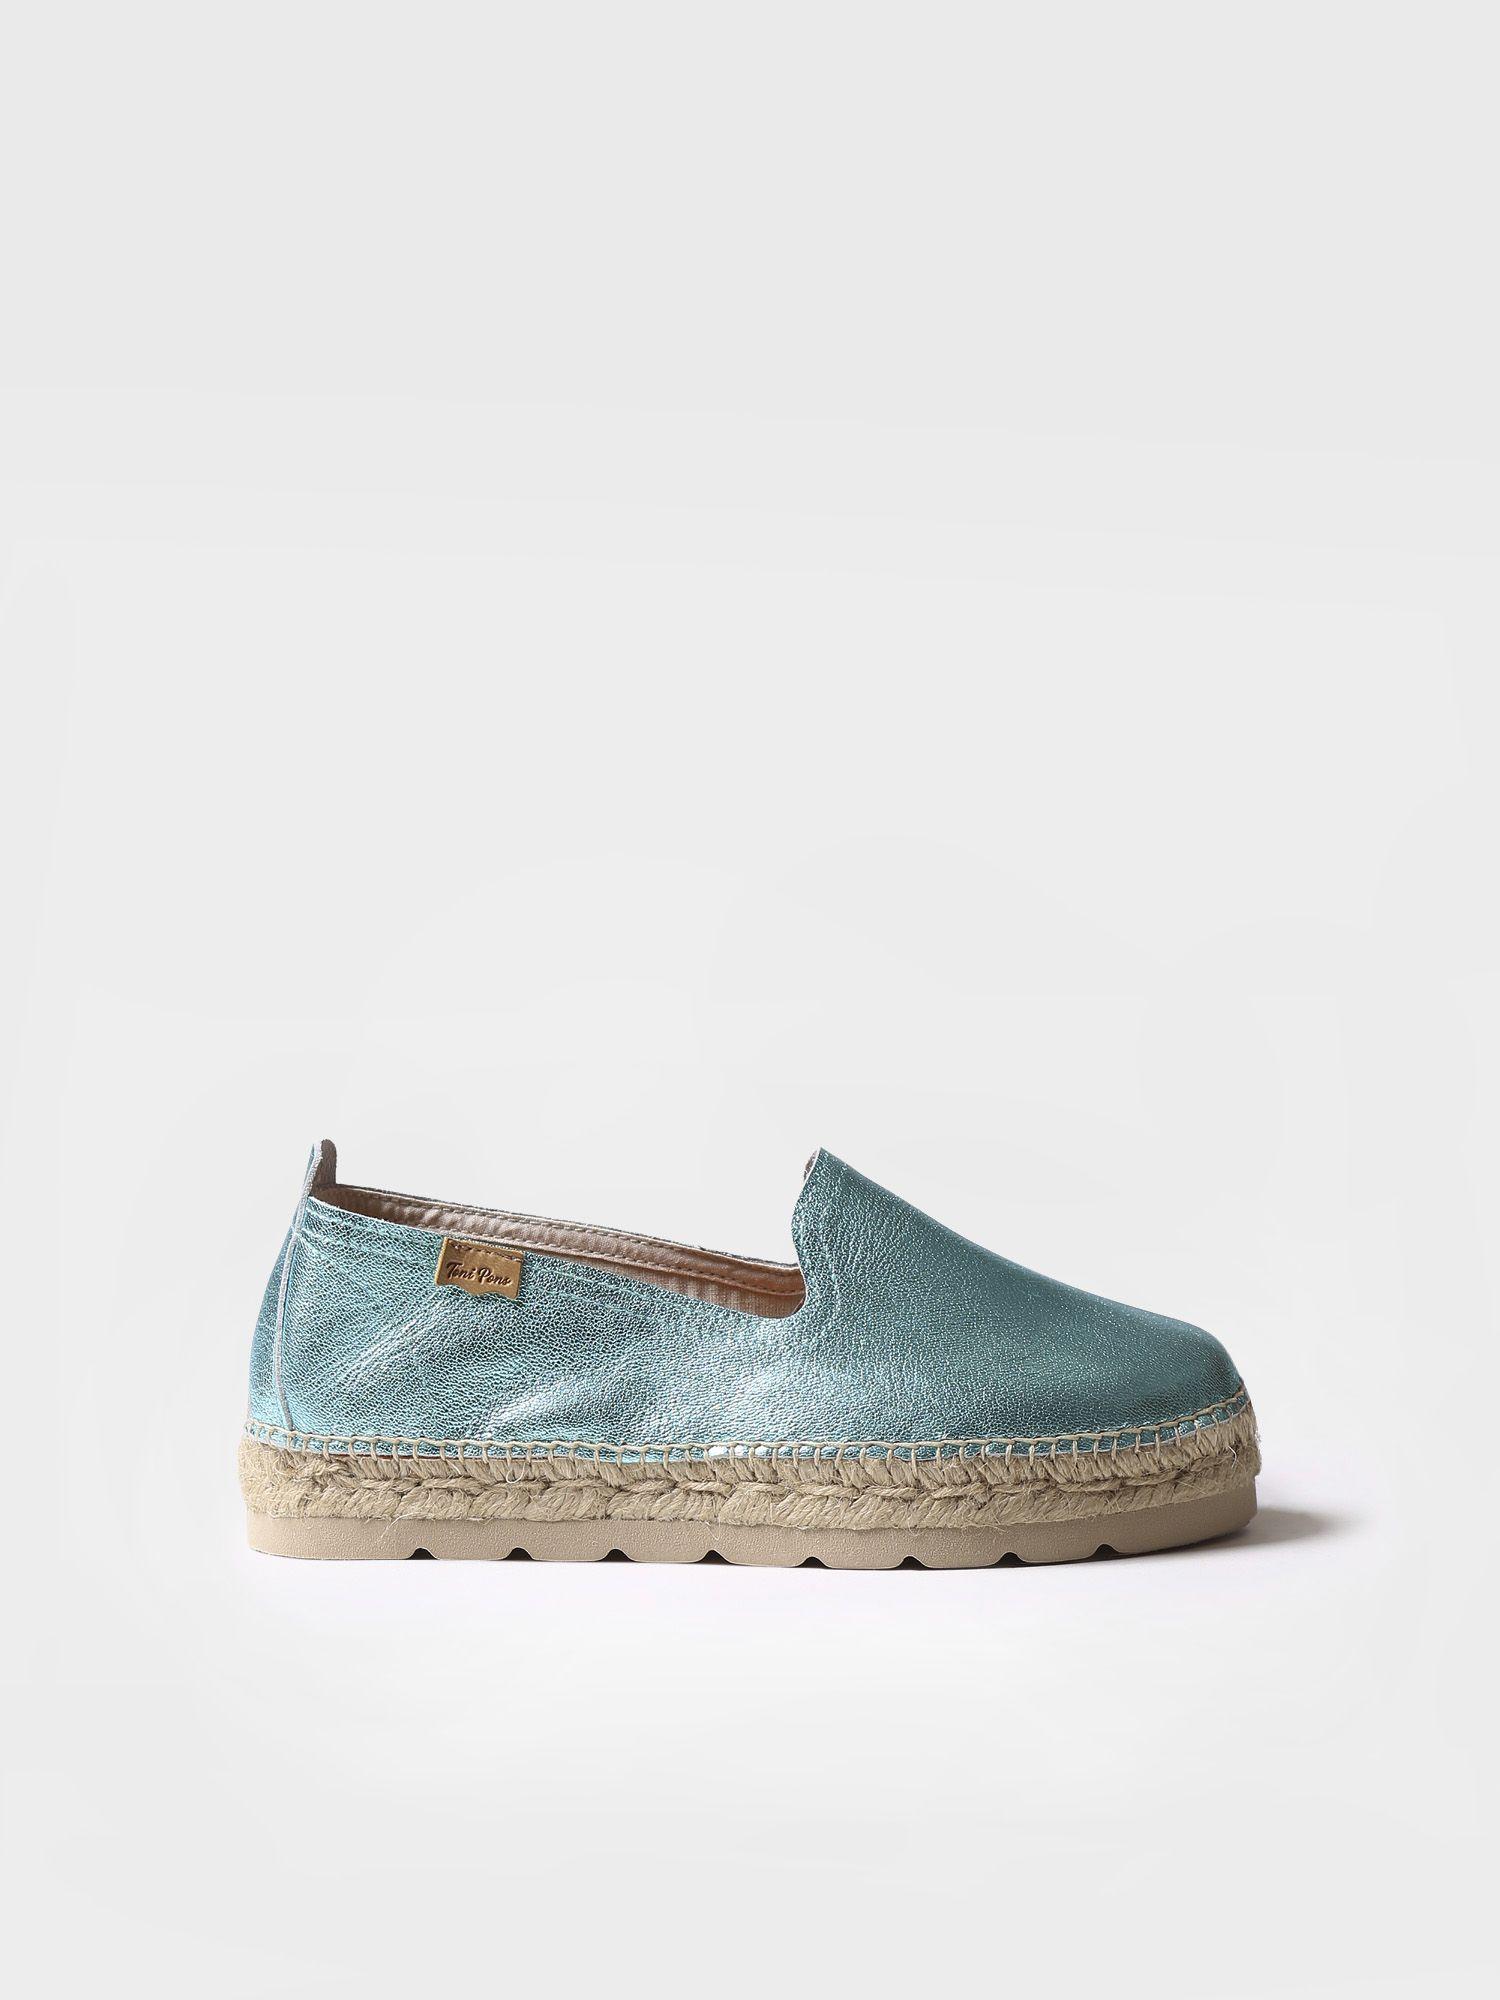 Leather flat espadrille - AURORA